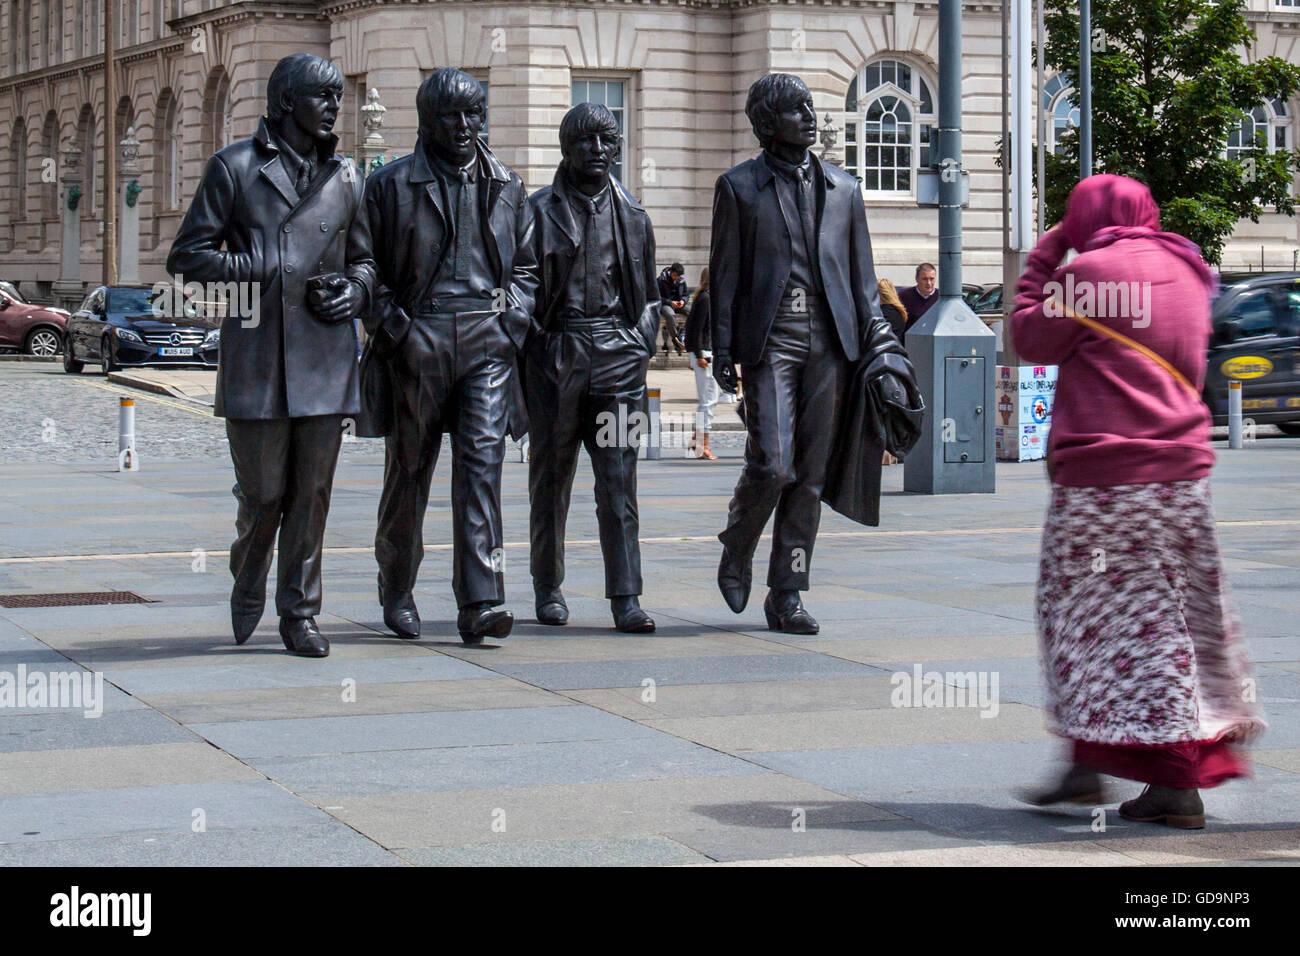 The Fabulous Four Beatles statues on the coastal riverside promenade on Liverpool's Waterfront, Merseyside, UK. - Stock Image